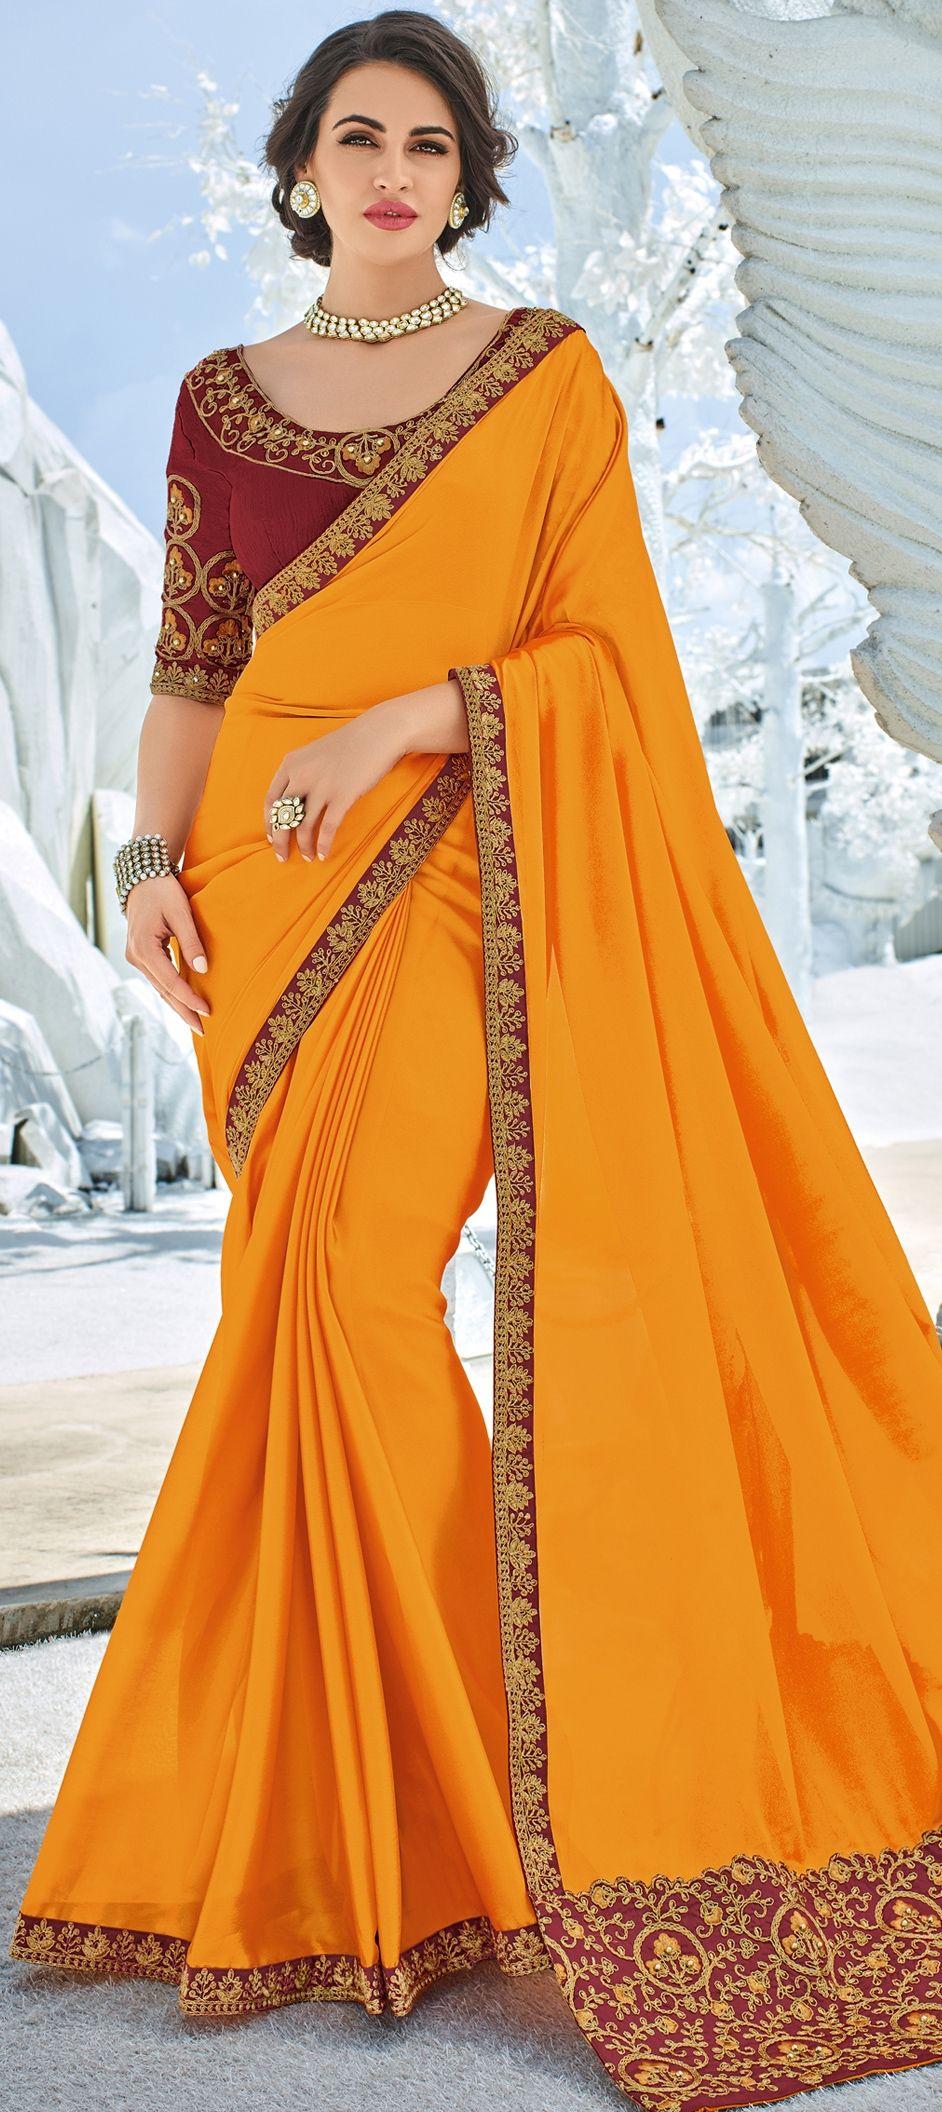 1ad835120a 1540038: Party Wear Orange color Faux Georgette fabric Saree